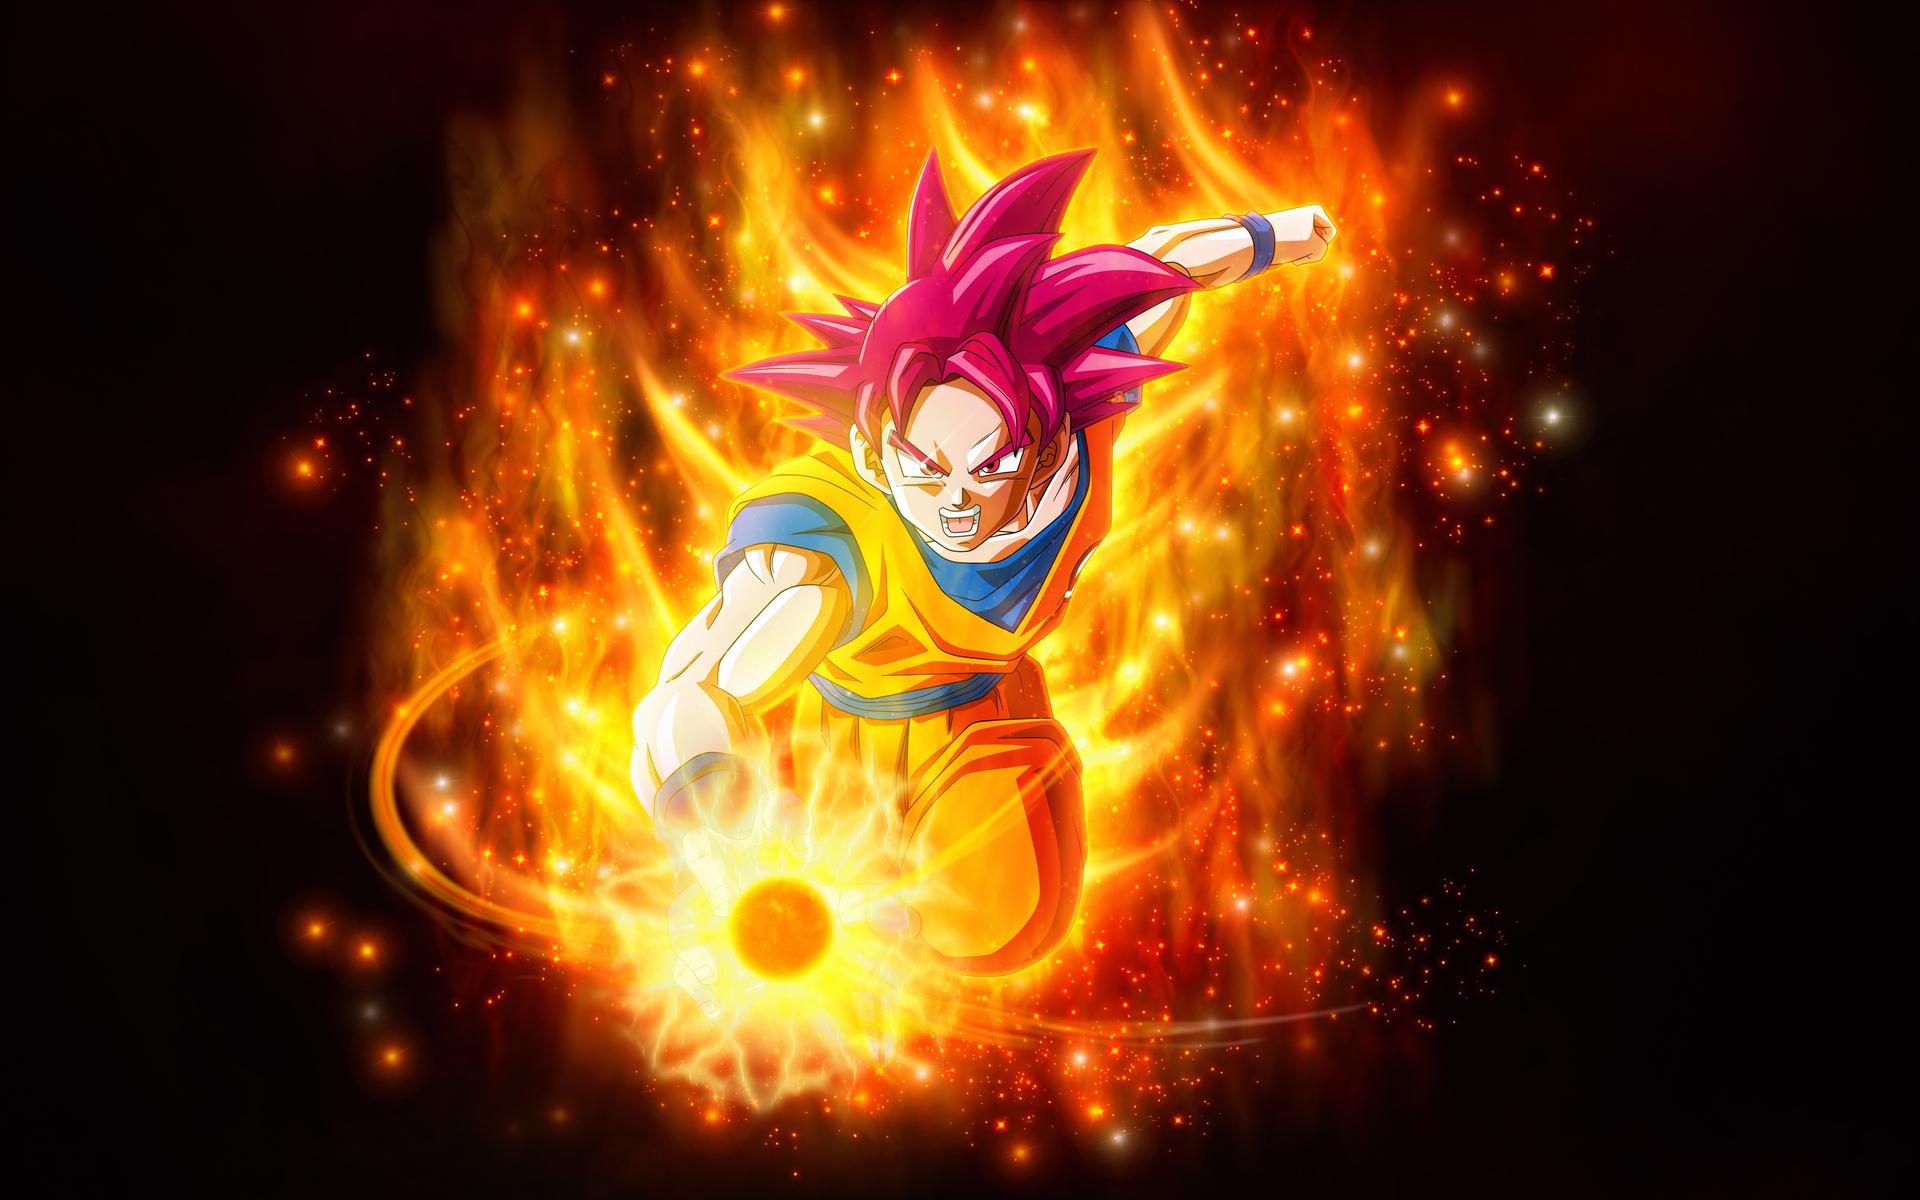 dragon-ball-super-super-saiyan-goku-jh.jpg